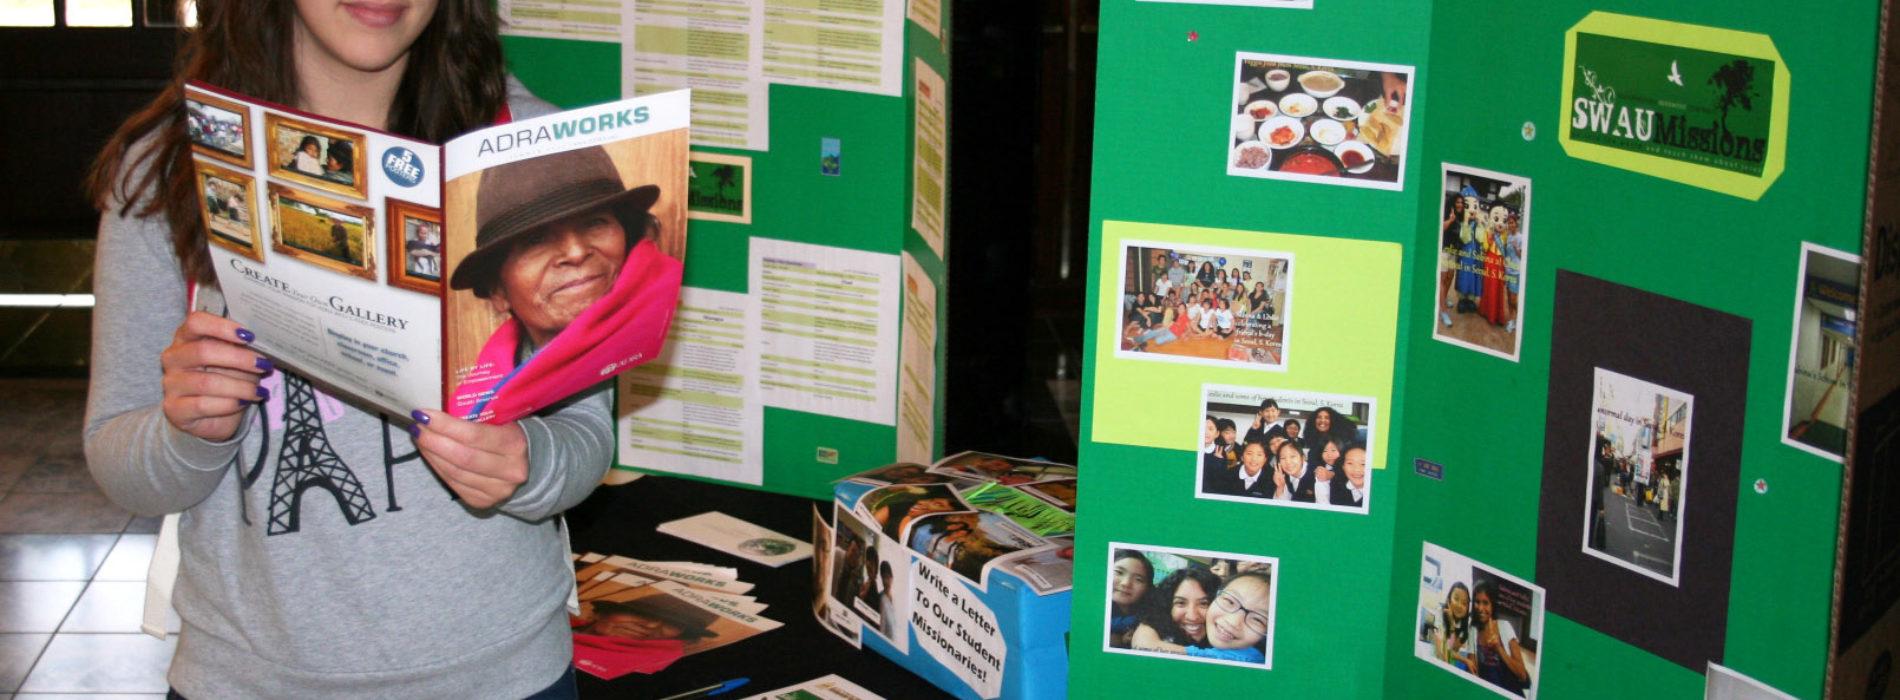 Campus Celebrates Missions Week